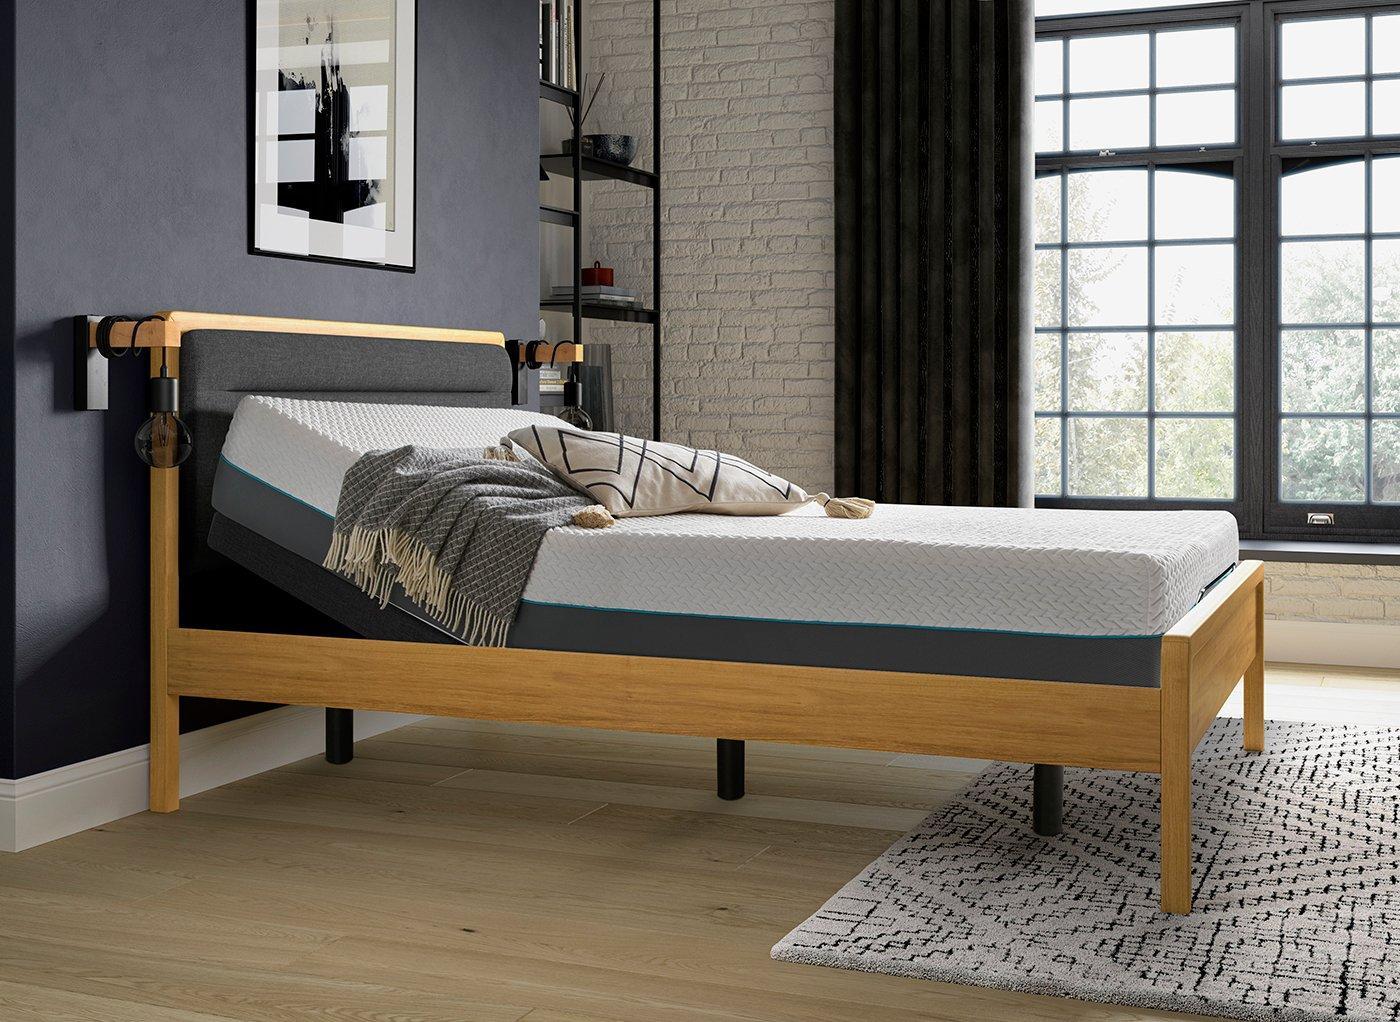 hastings-sleepmotion-adjustable-wooden-bed-frame